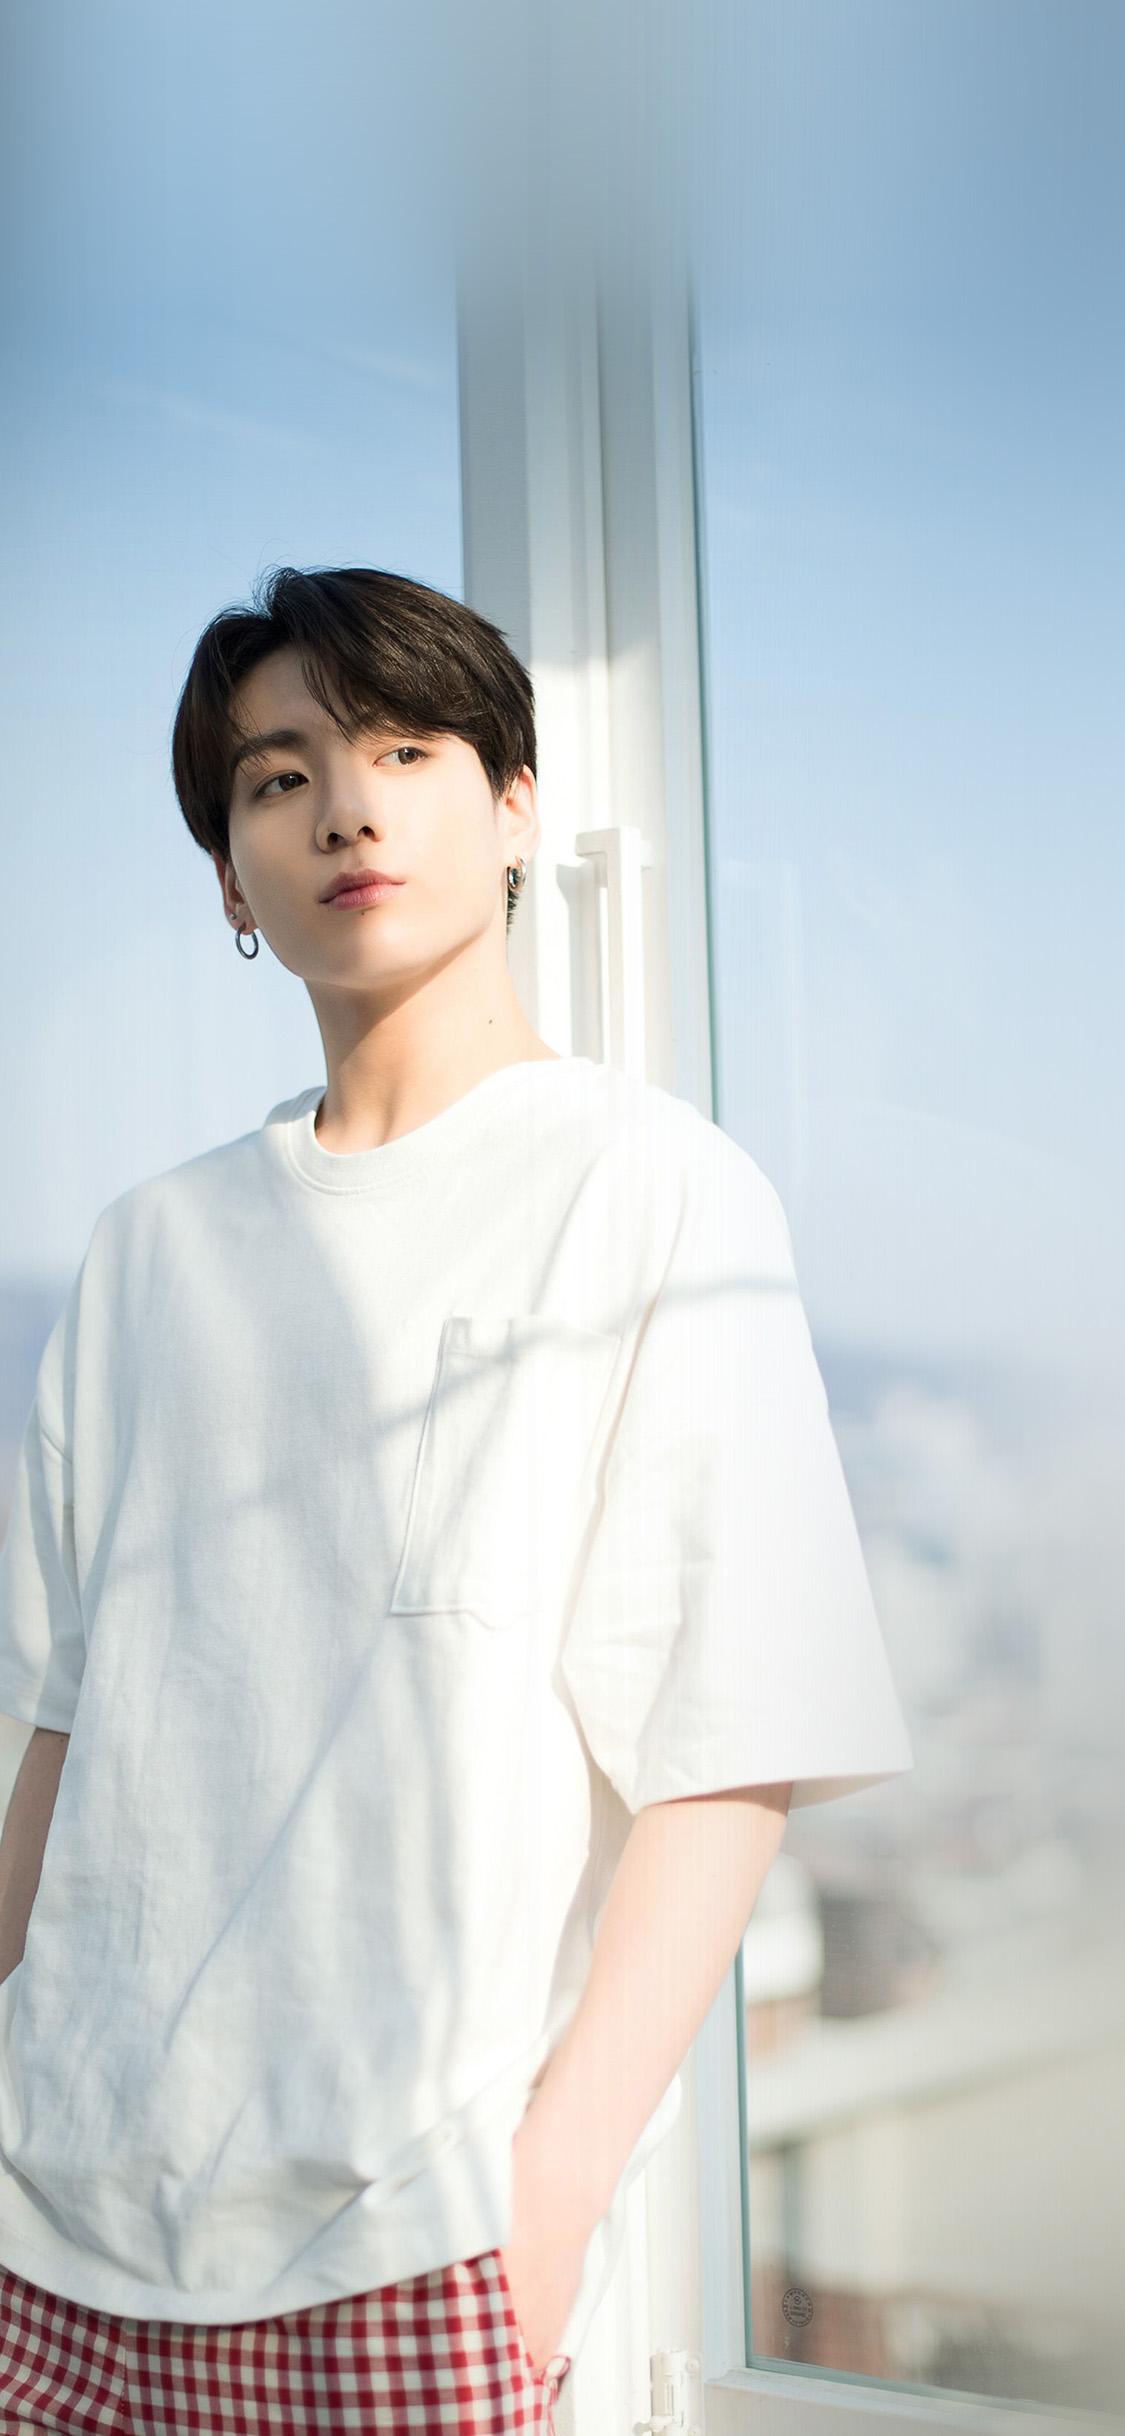 papers.co hs93 bts jungook boy kpop music 41 iphone wallpaper